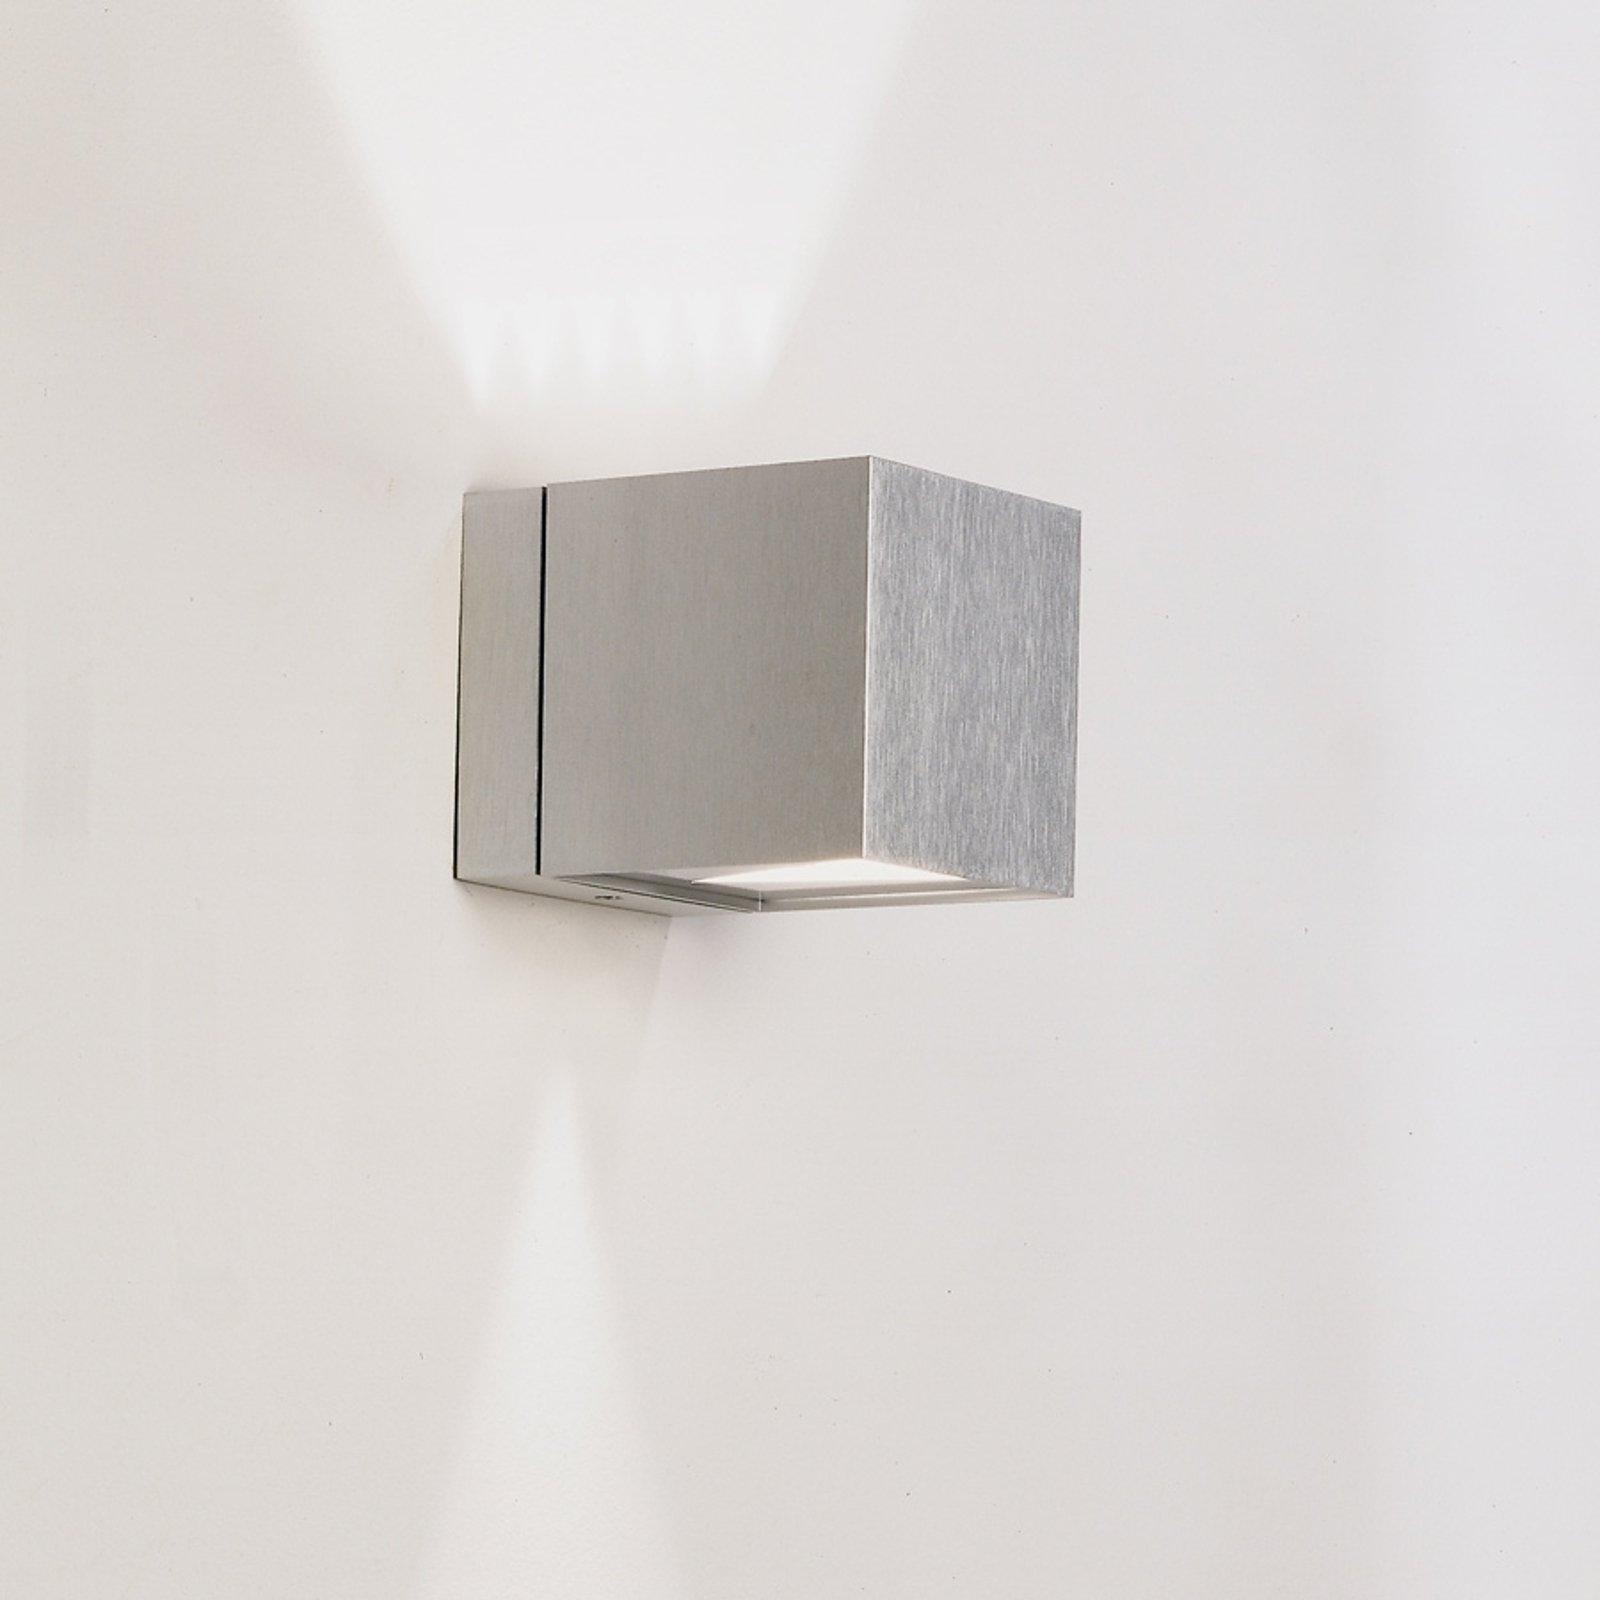 Vegglampe Dau med terningform up-og downlight alu